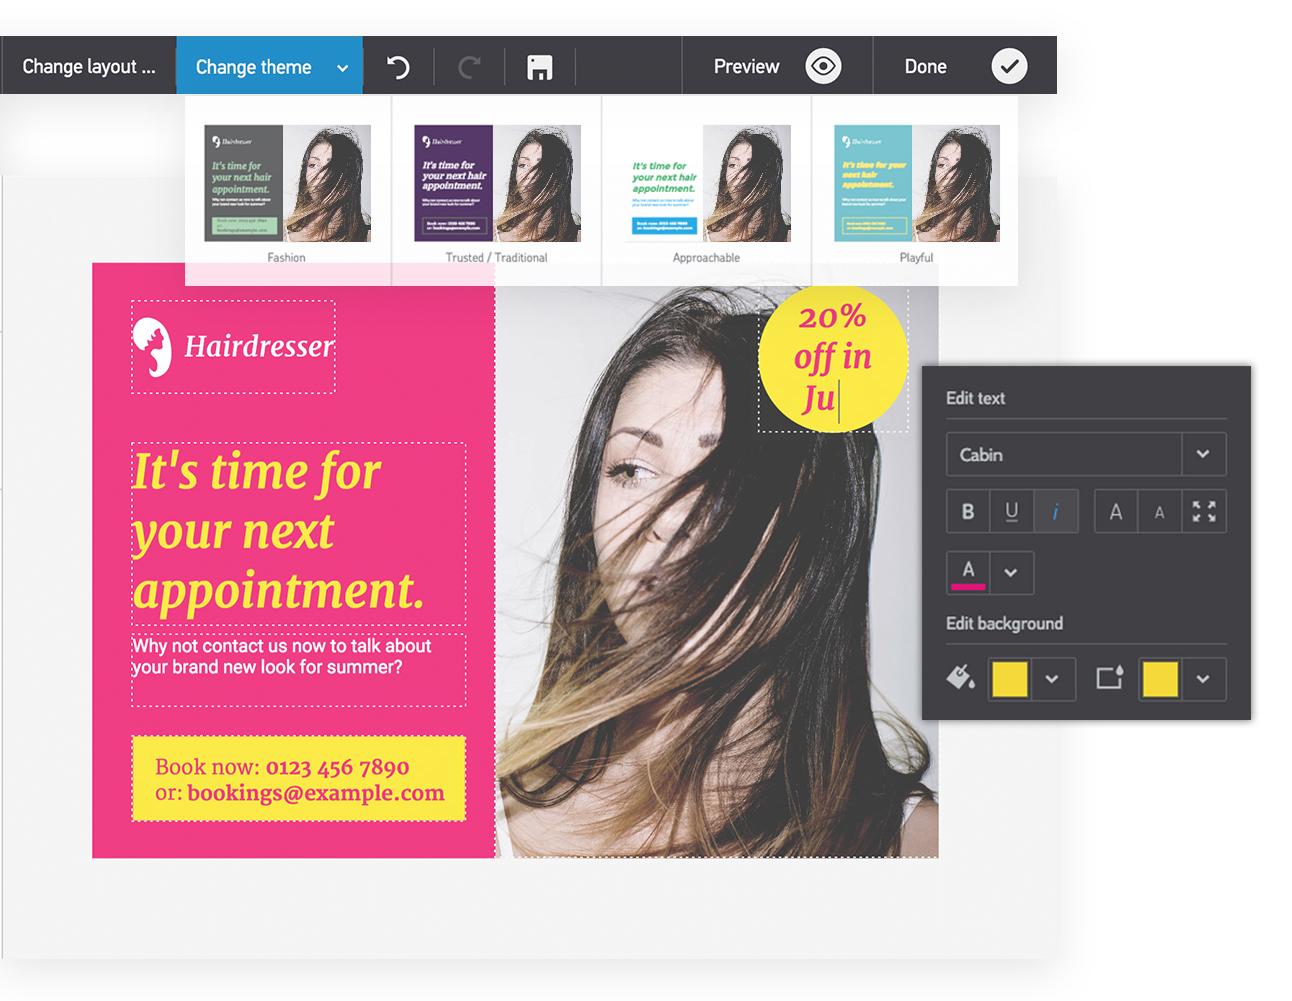 RoyalMail launches MailshotMaker